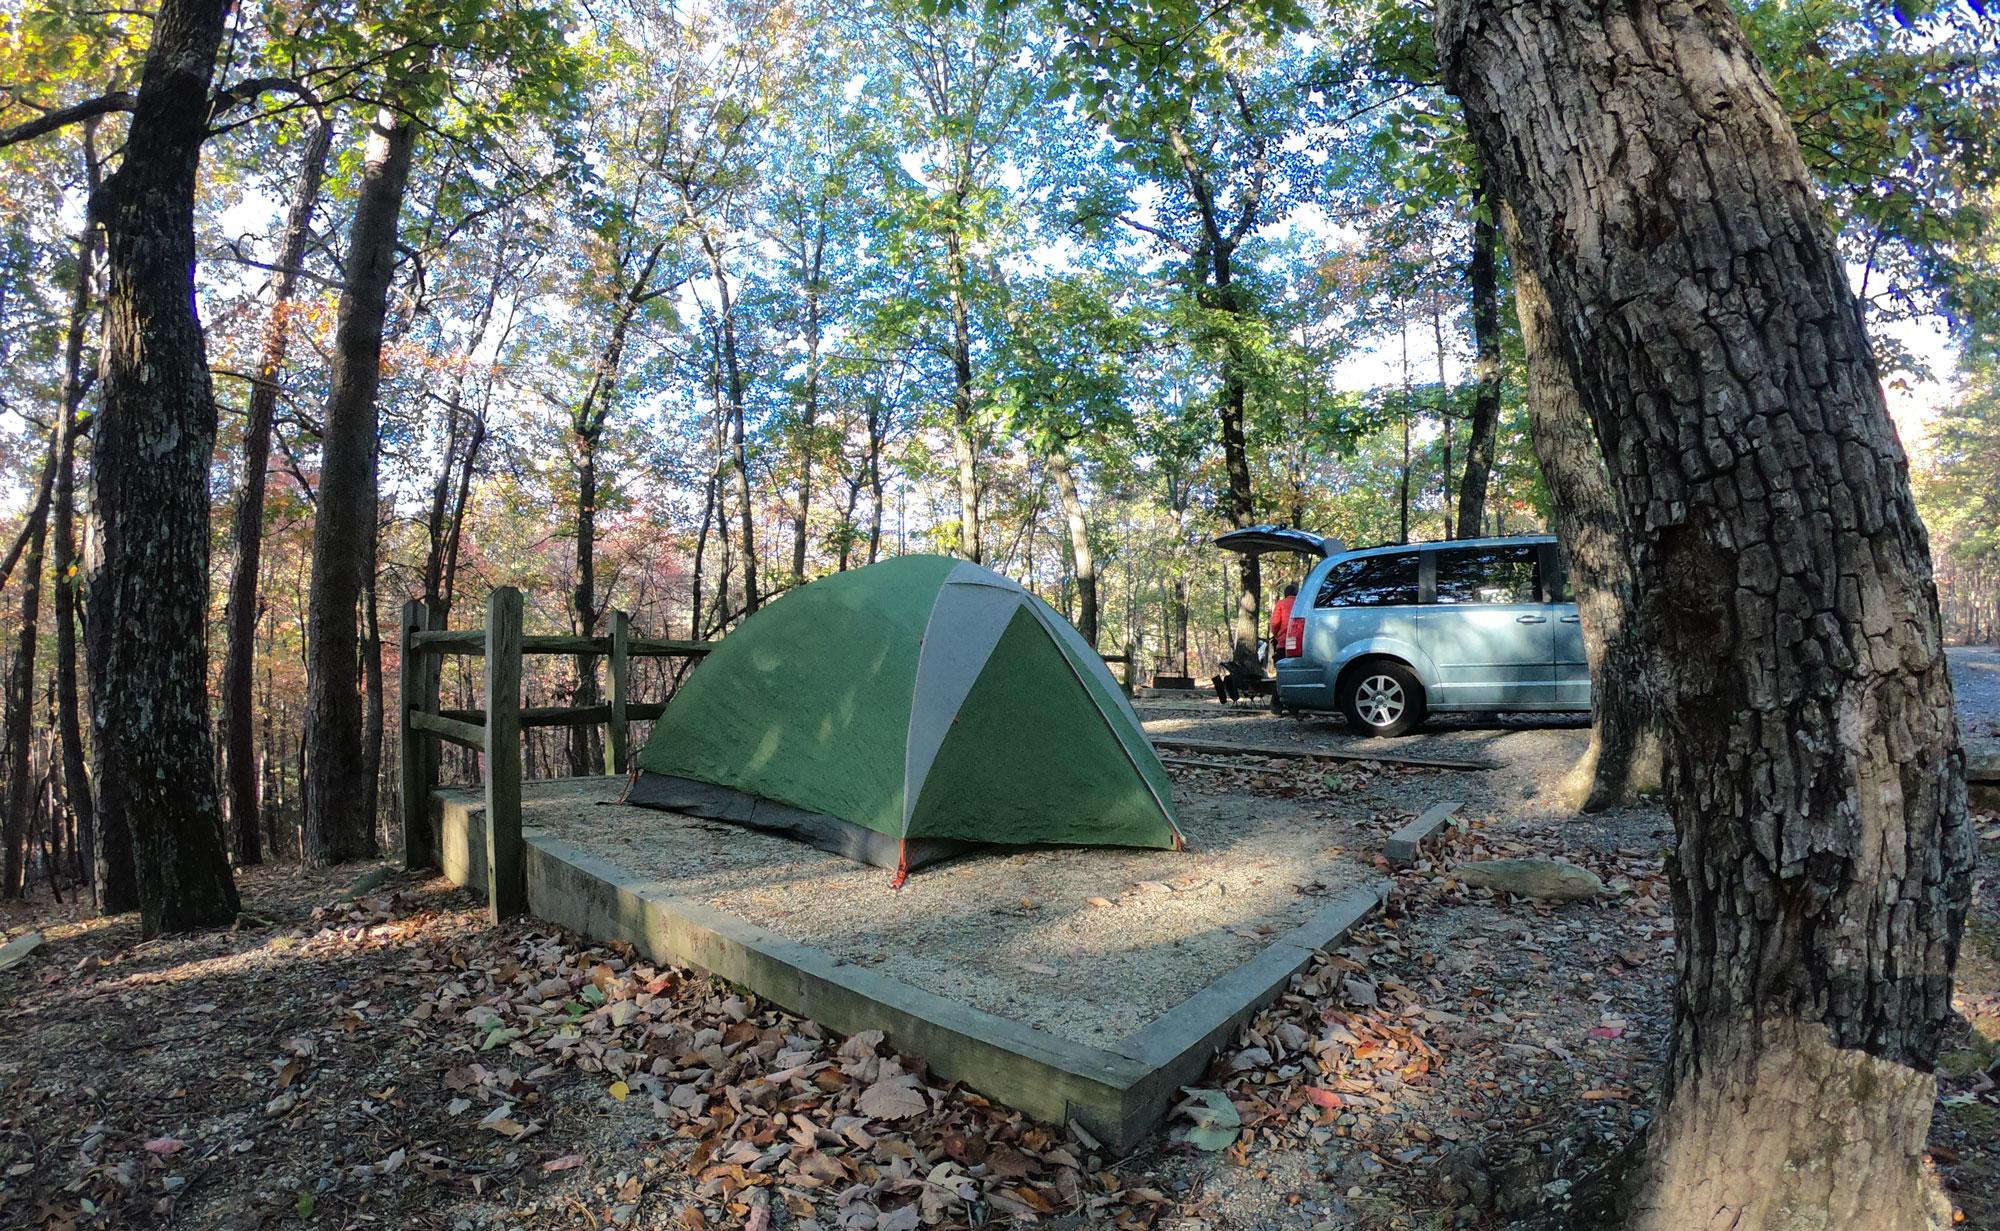 Green Tent and van at campsite of Hanging Rock State Park, North Carolina